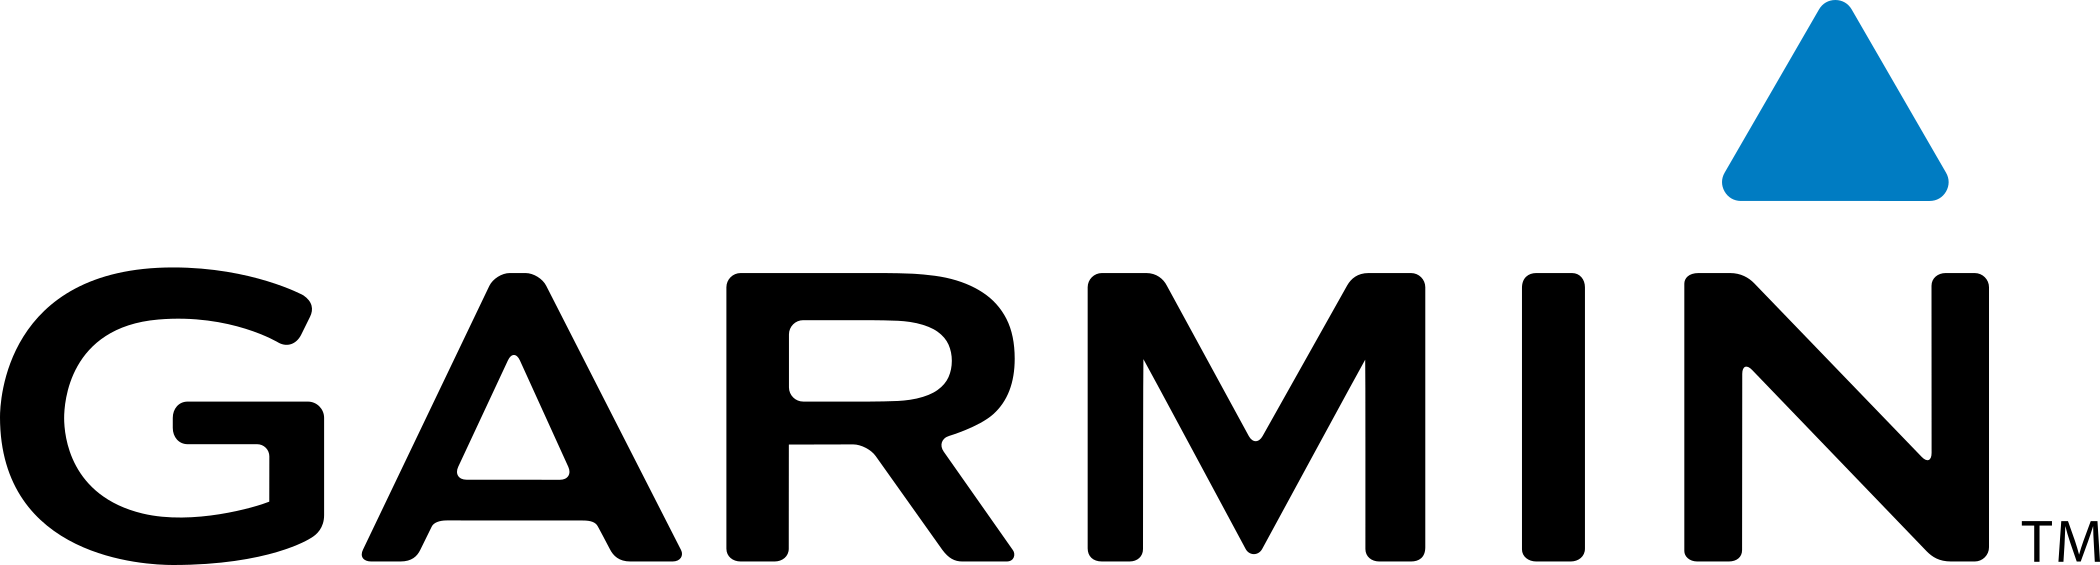 Garmin-logo-2